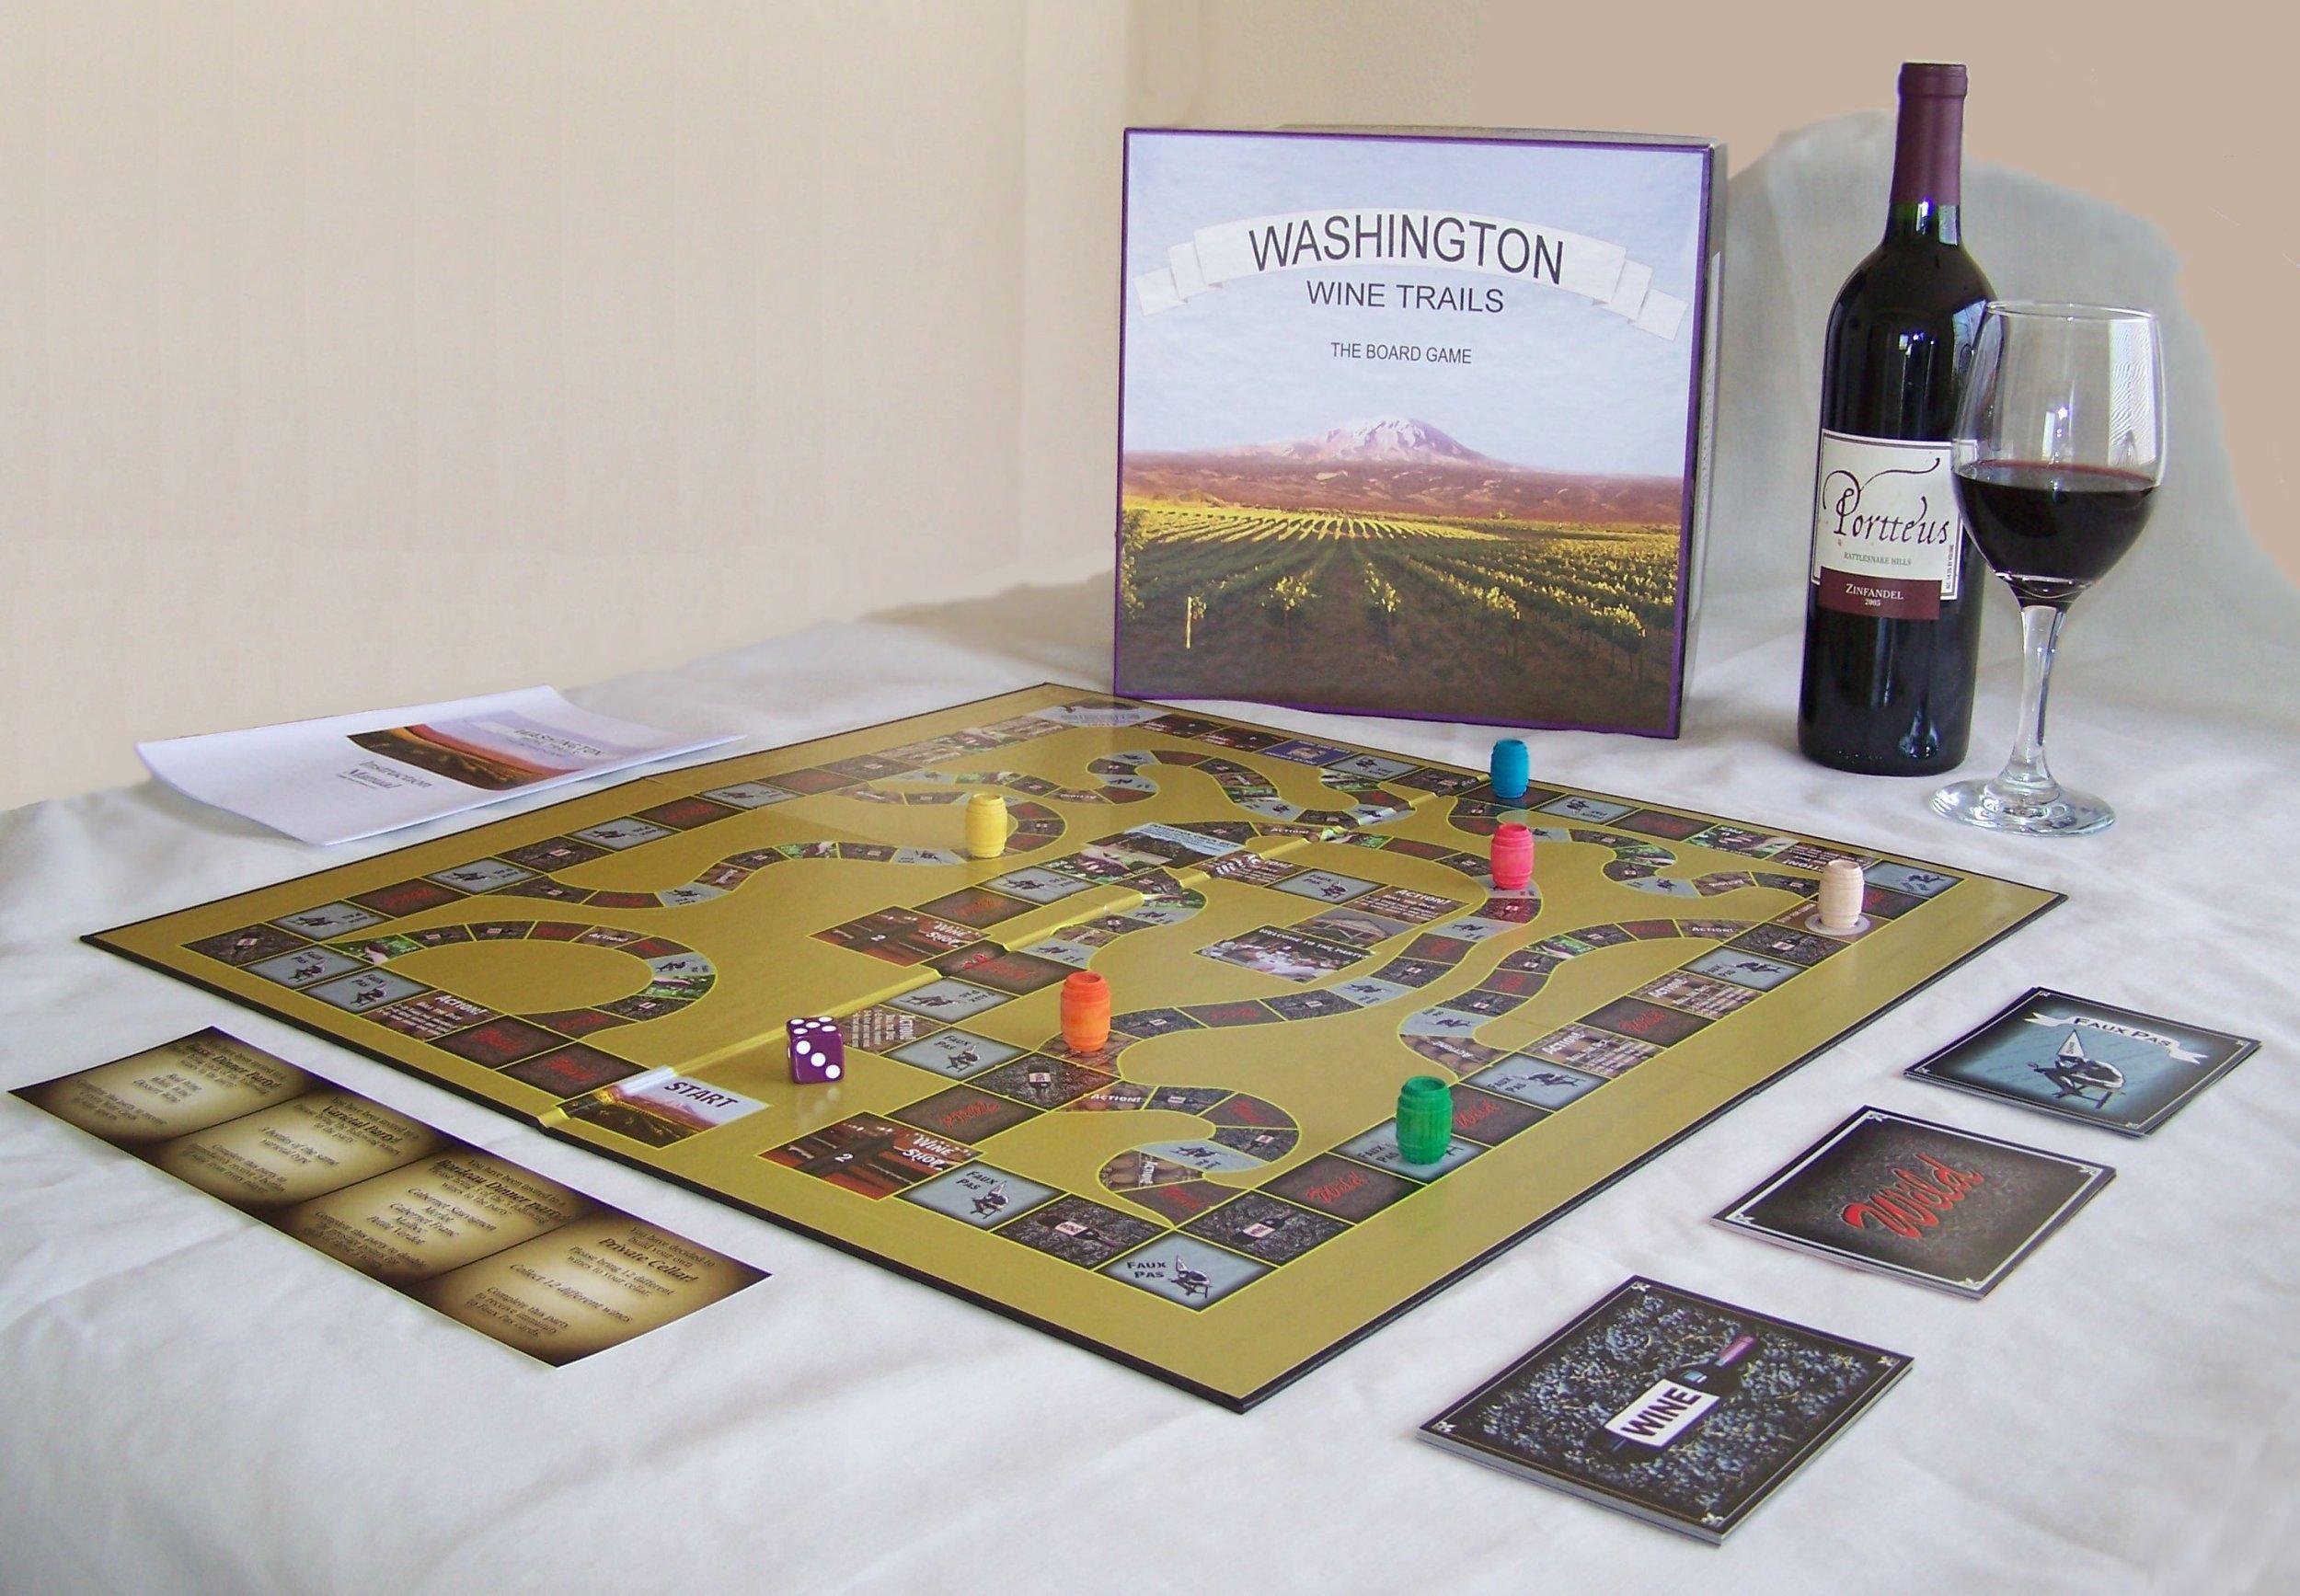 1 X Washington Wine Trails Board Game